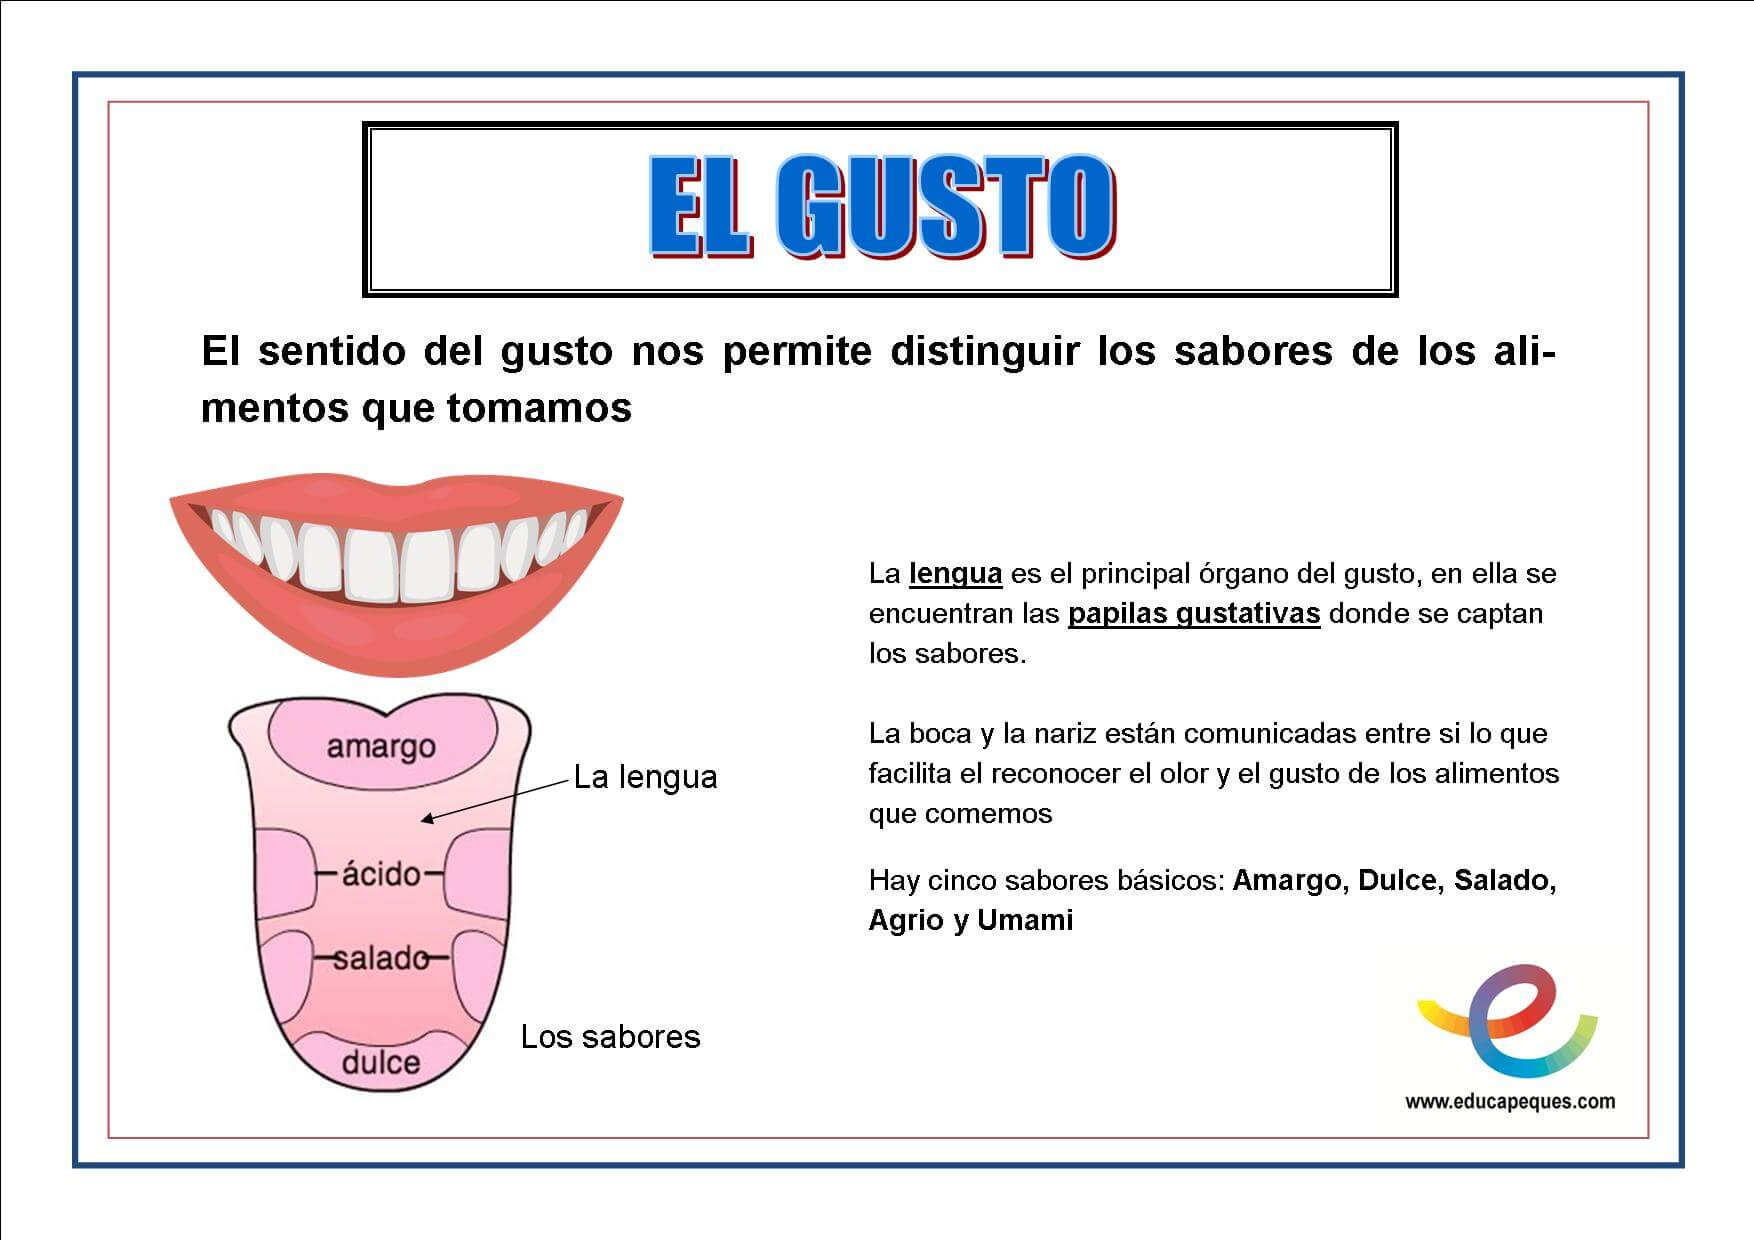 https://www.educapeques.com/wp-content/uploads/2013/10/el-gusto.jpg